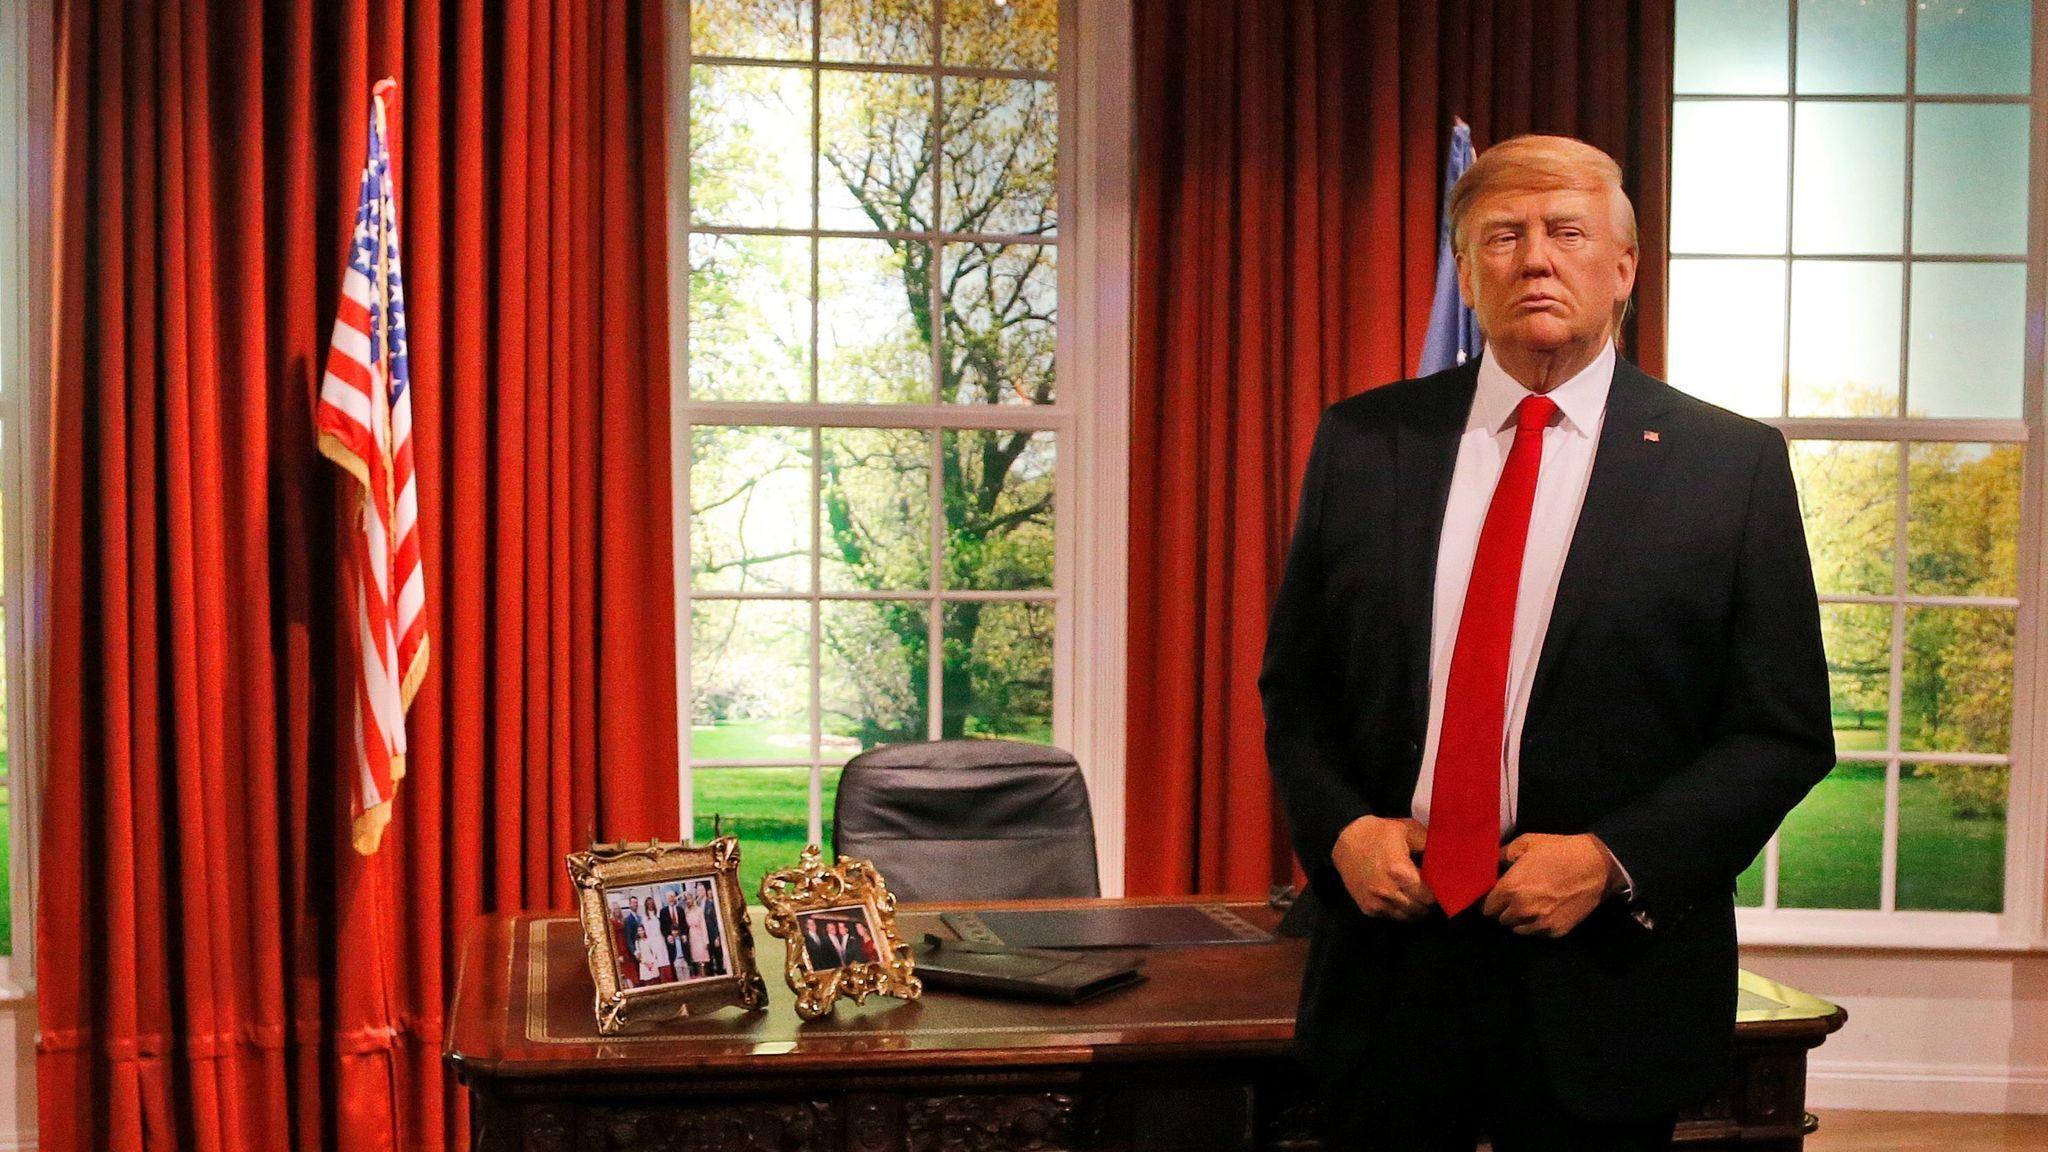 Trump Wax Figure Unveiled At Madame Tussauds Orlando